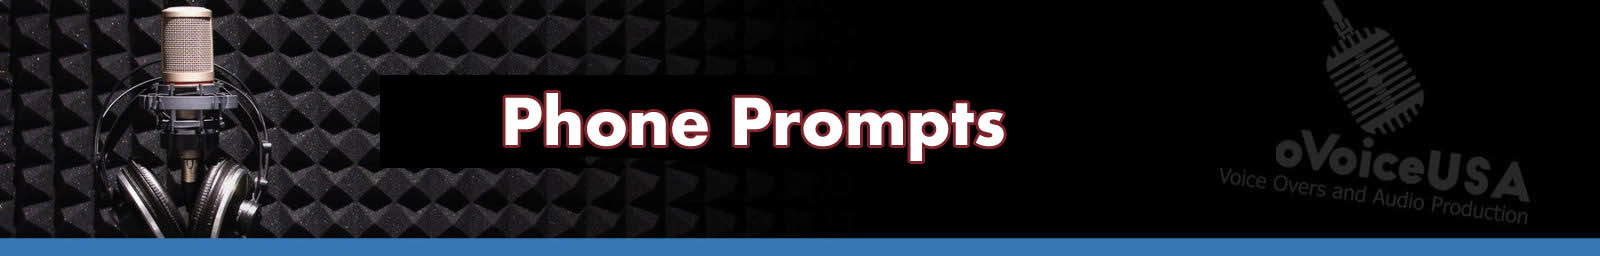 Phone Prompts Header